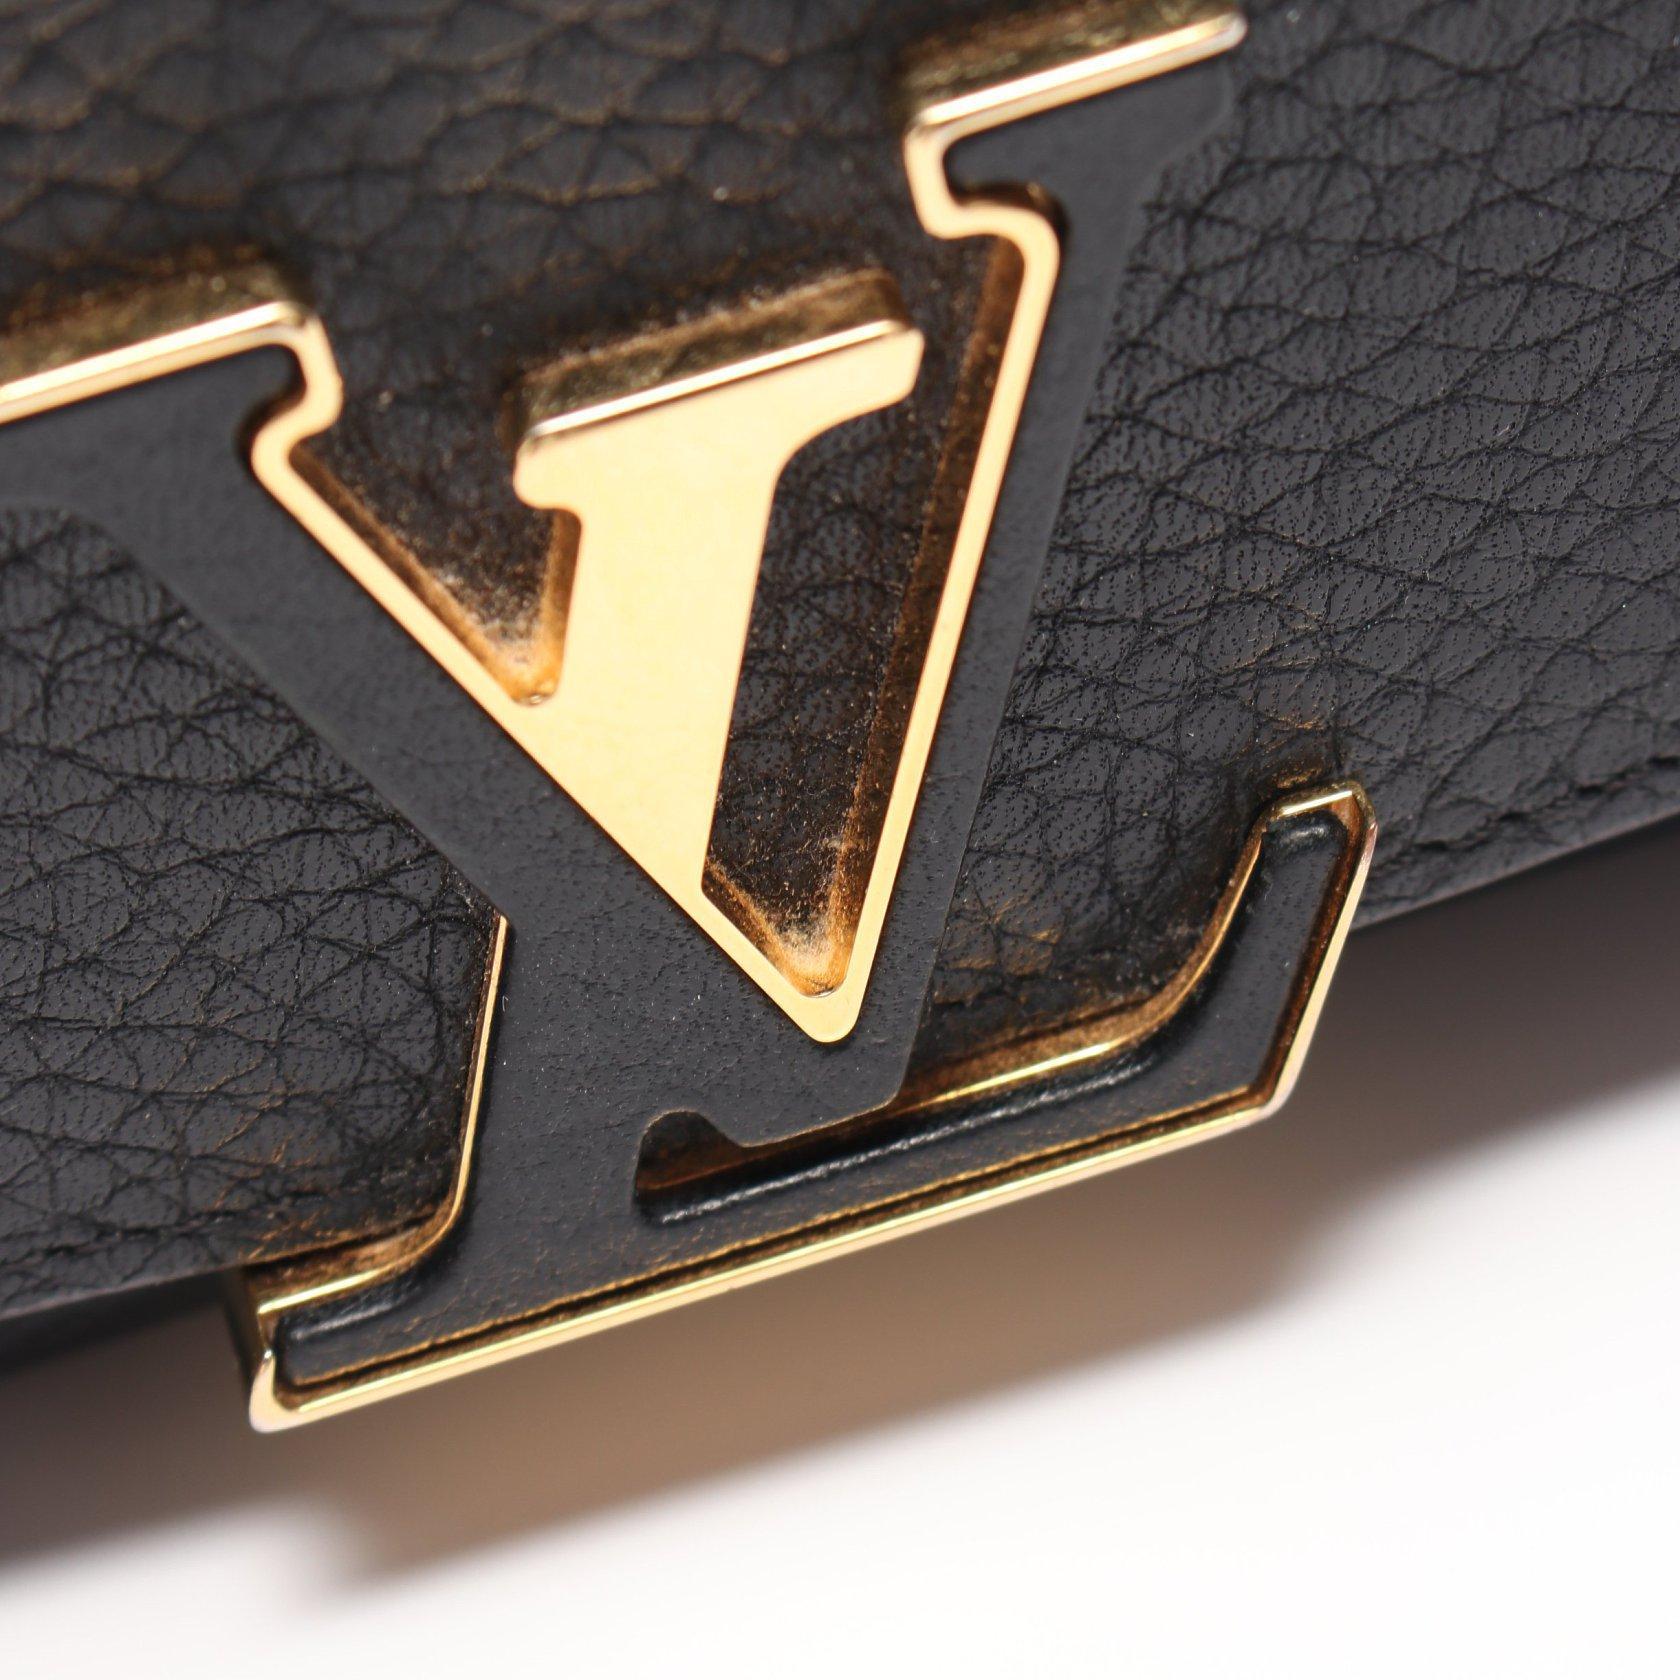 LOUIS VUITTON・財布・小物・ポルトフォイユ カプシーヌ トリヨン ノワール 二つ折り長財布 レザー ブラック